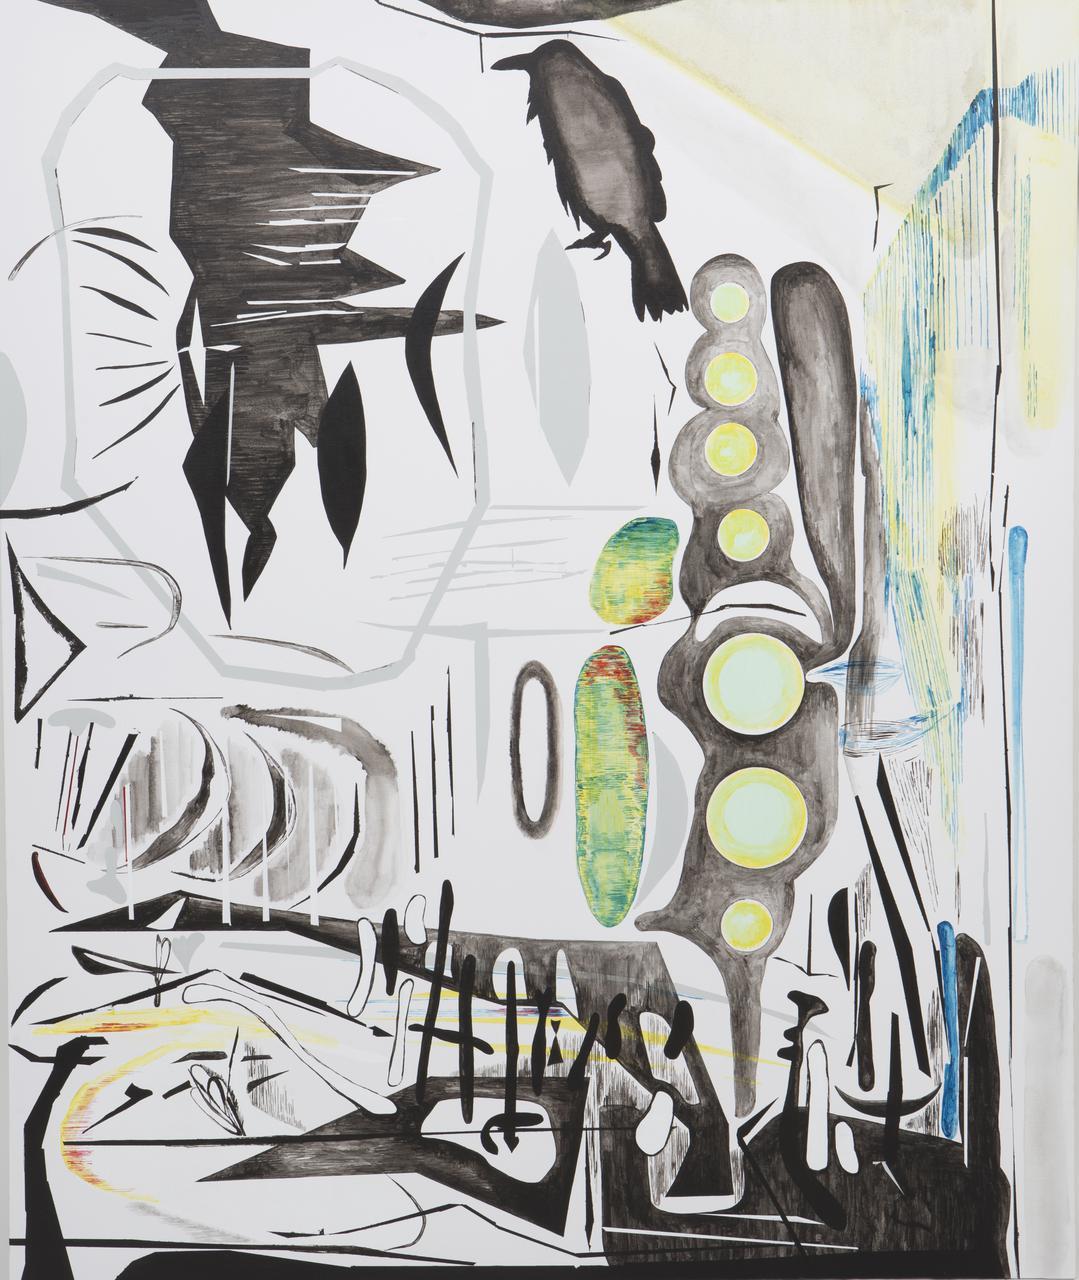 Vana Fertaki, Corax, oil and varnish on canvas, 120 x 100 cm, 2017